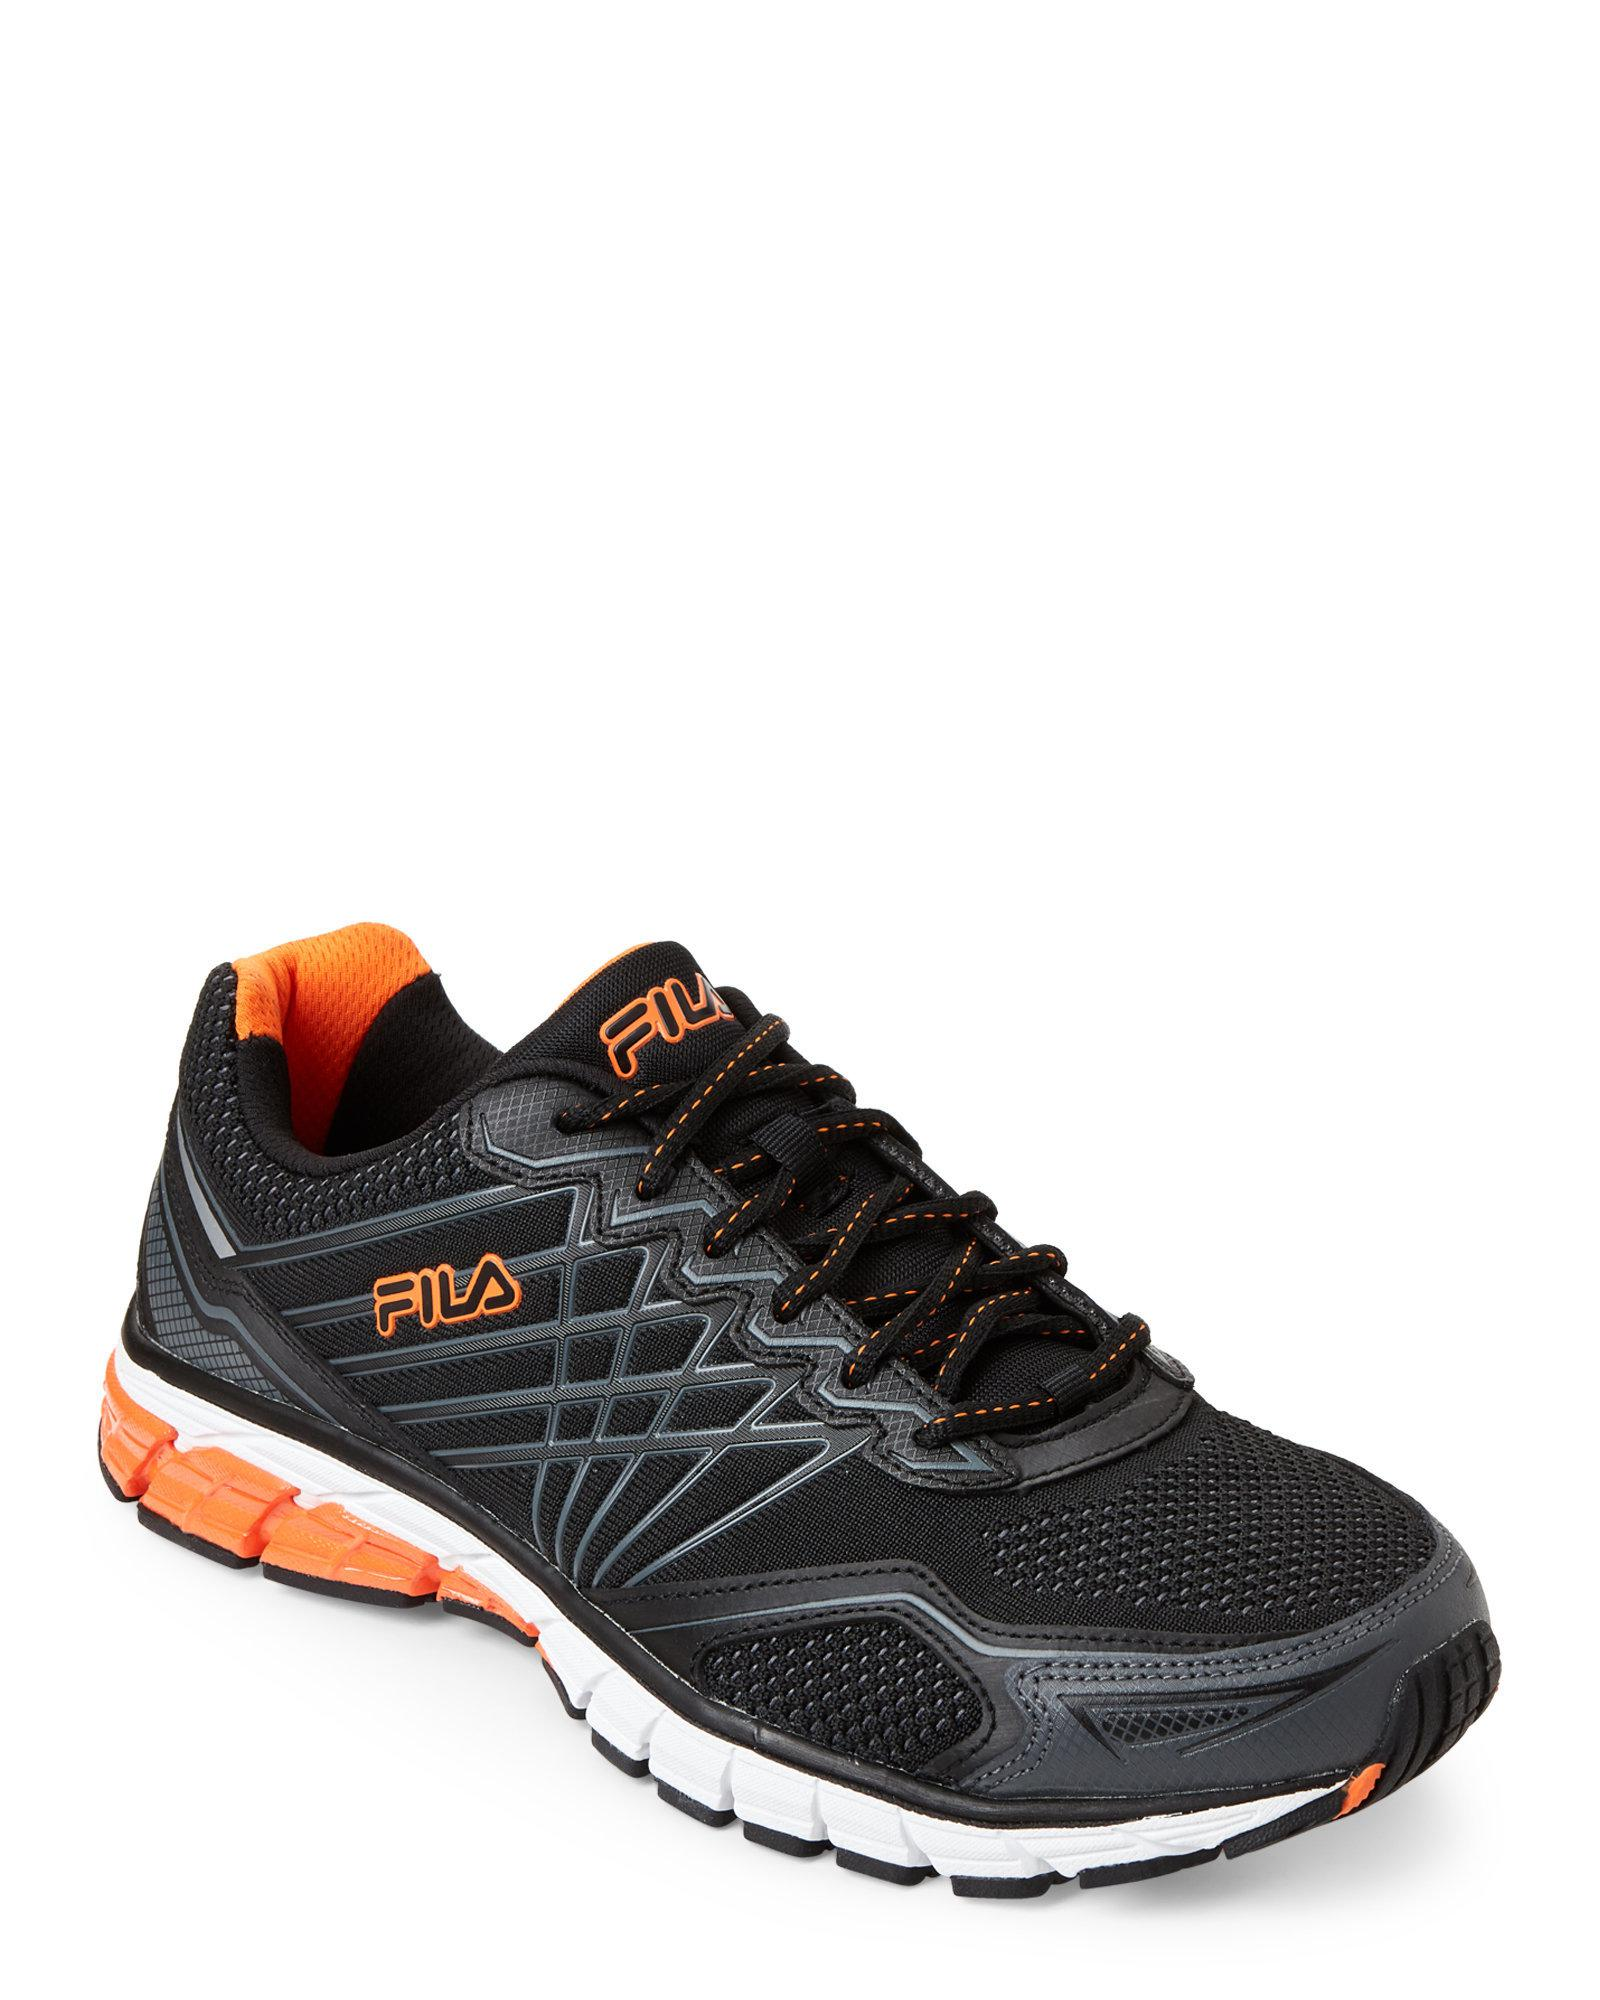 b6059f6f0db92 Fila Black & Orange Steel Strike 5 Energized Running Sneakers for men